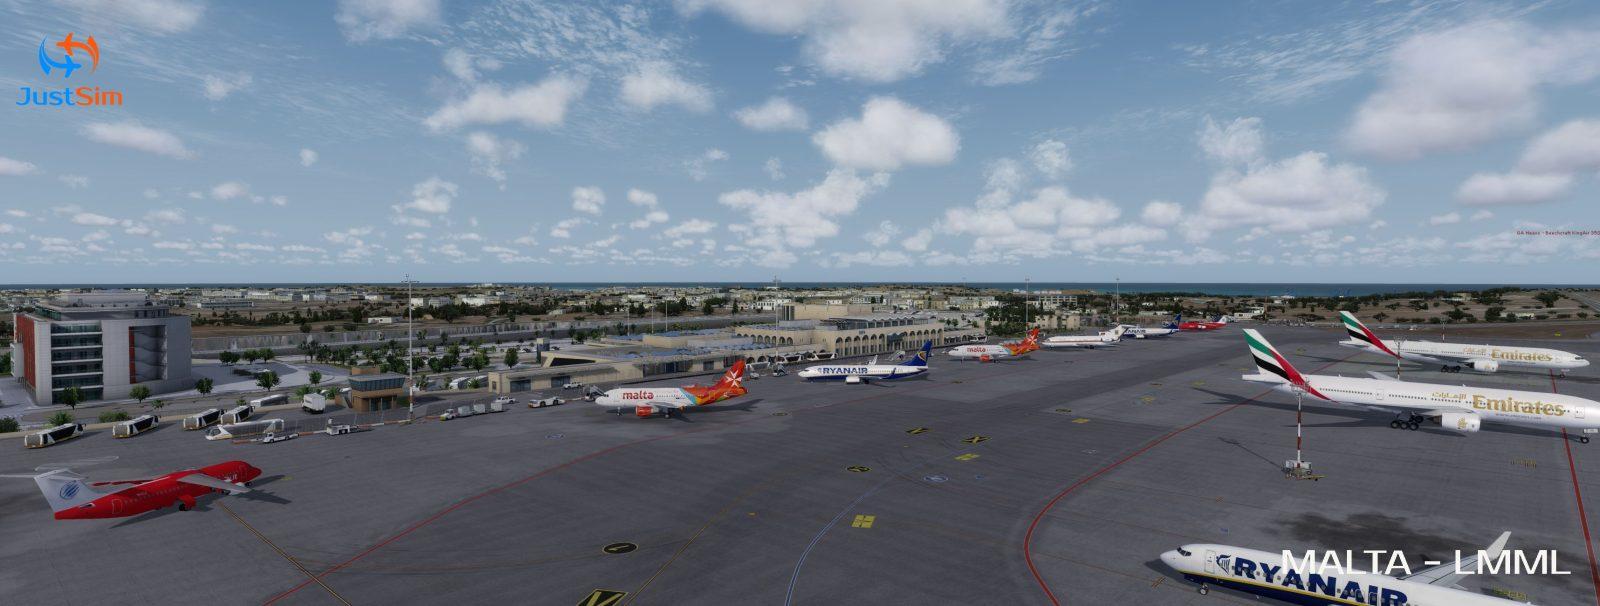 JustSim Malta Intl  Airport (LMML) Released – FSElite